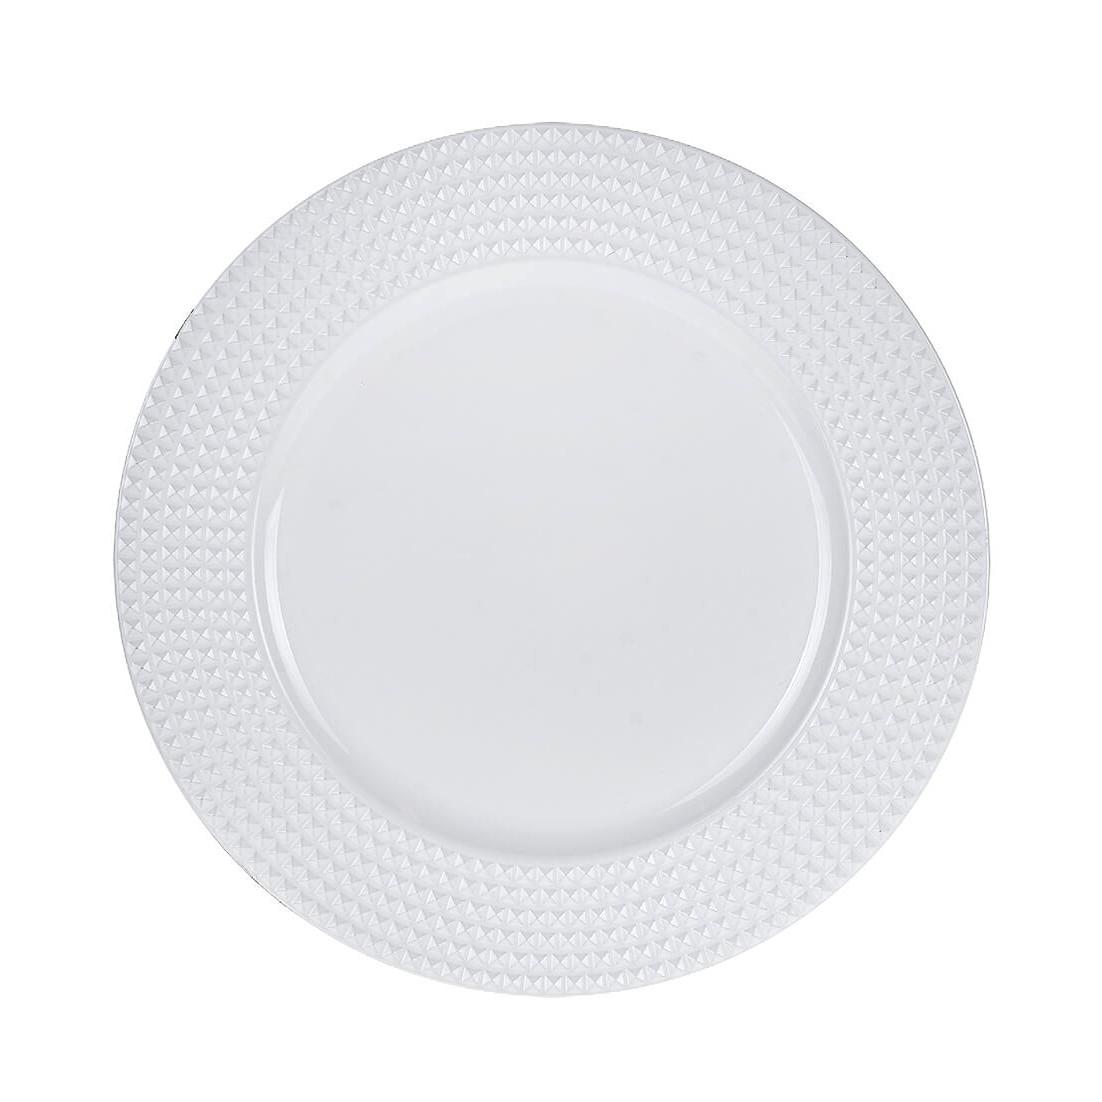 Sousplat Redondo Plastico 33cm Branco 43692-008 - G Presentes